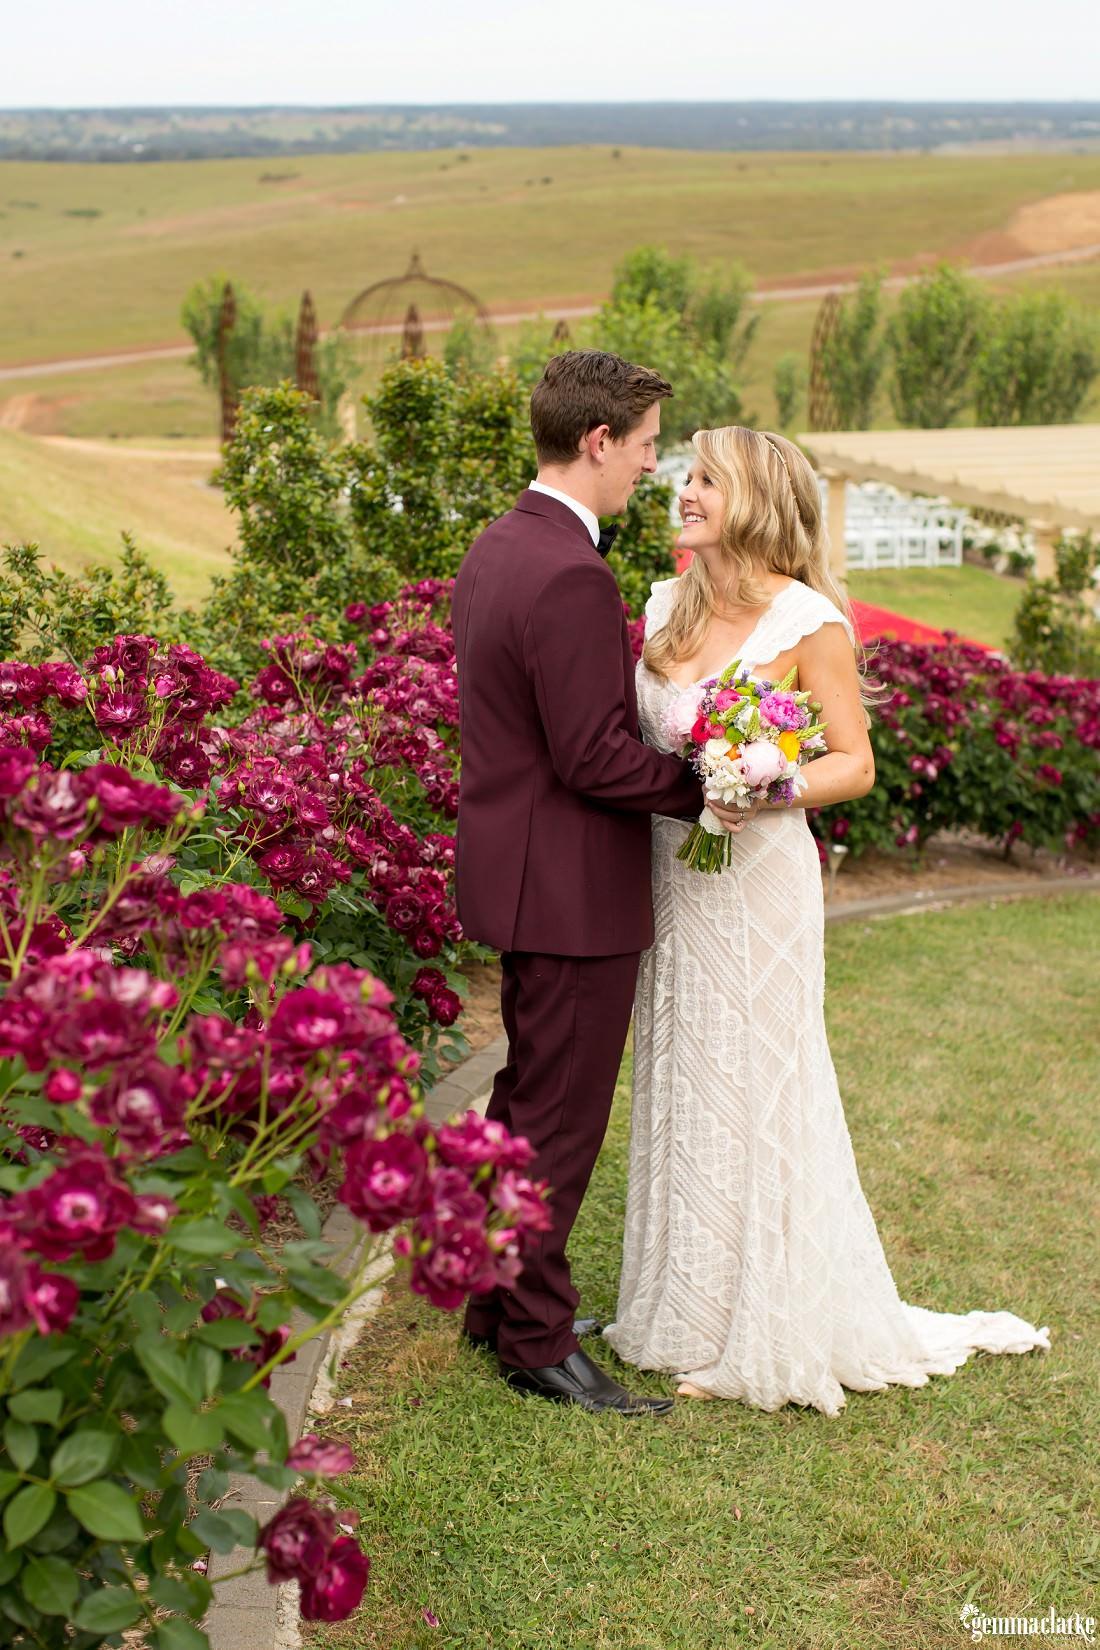 gemmaclarkephotography_sheldonbrook-wedding_country-wedding_lauren-and-mitchell_0062